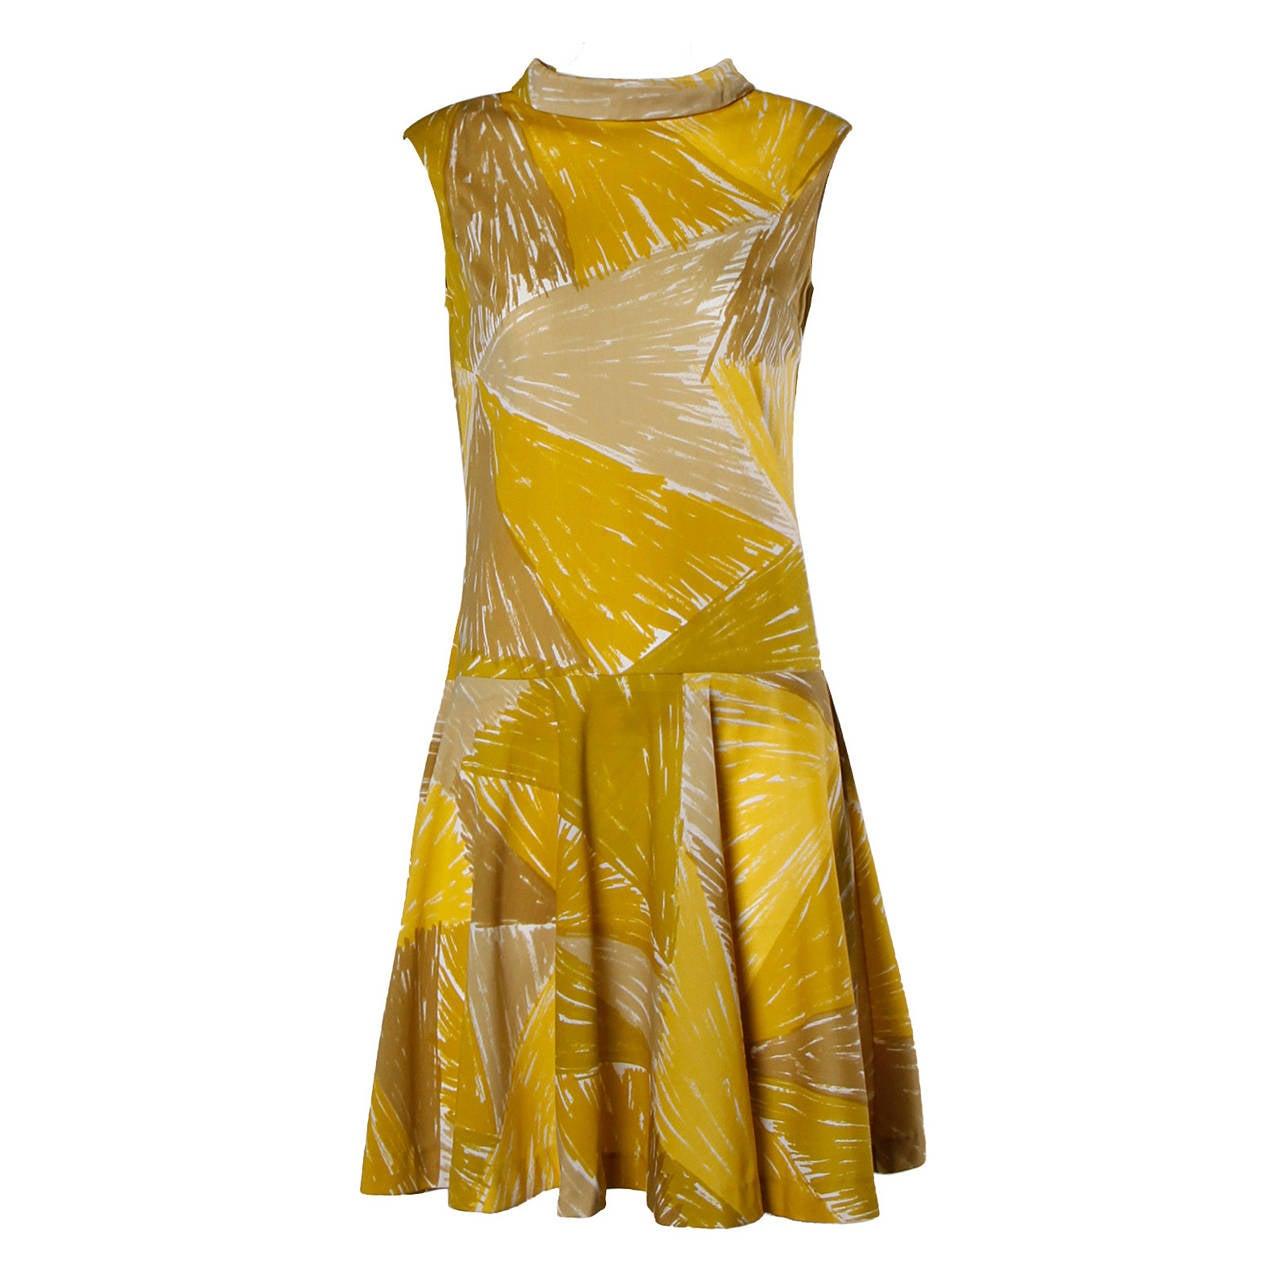 Vera Neumann Vintage 1960s Yellow Mod Painterly Print Mini Dress For Sale